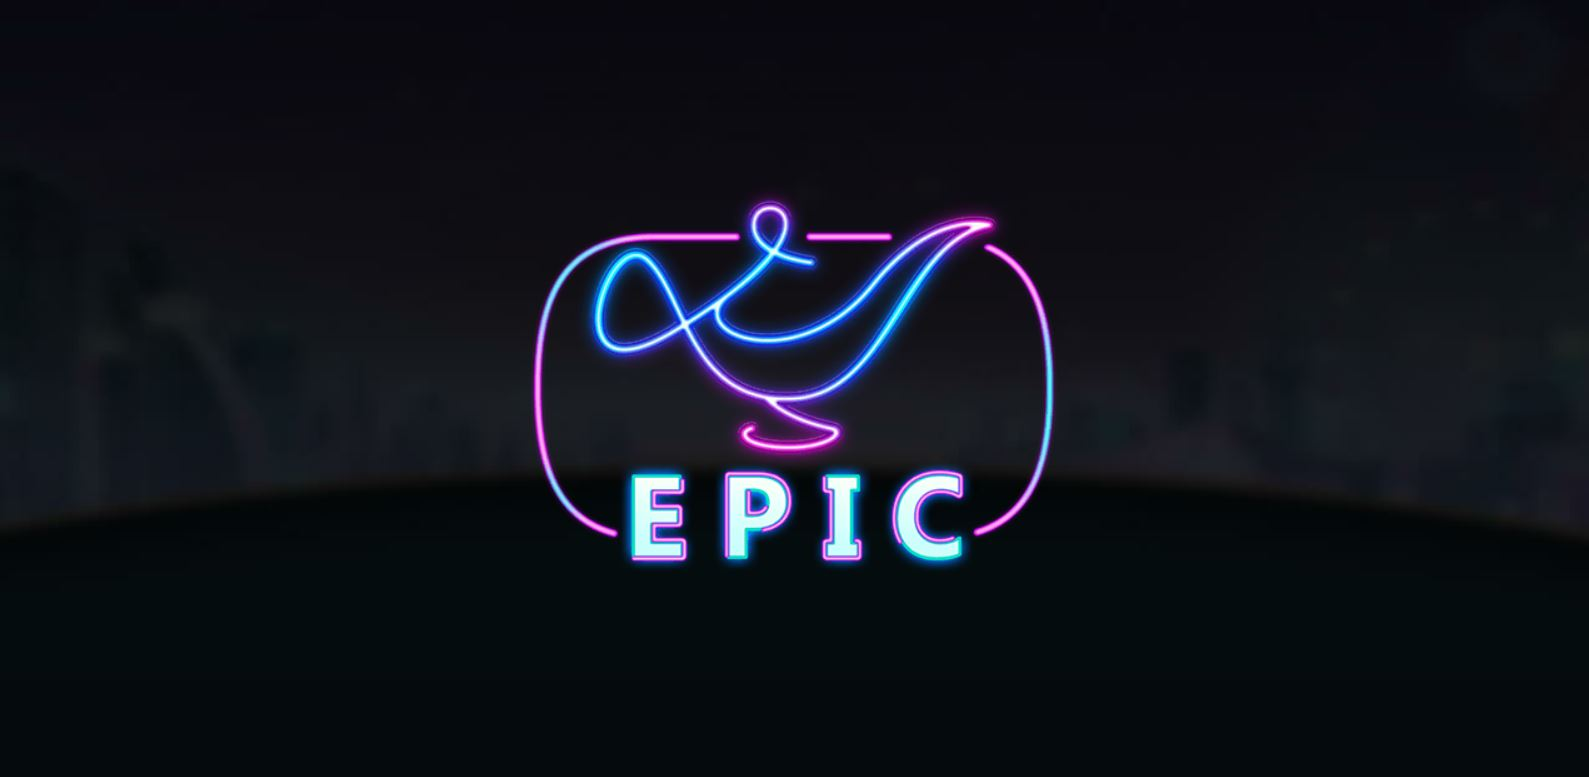 epicwin-epic-slot-login